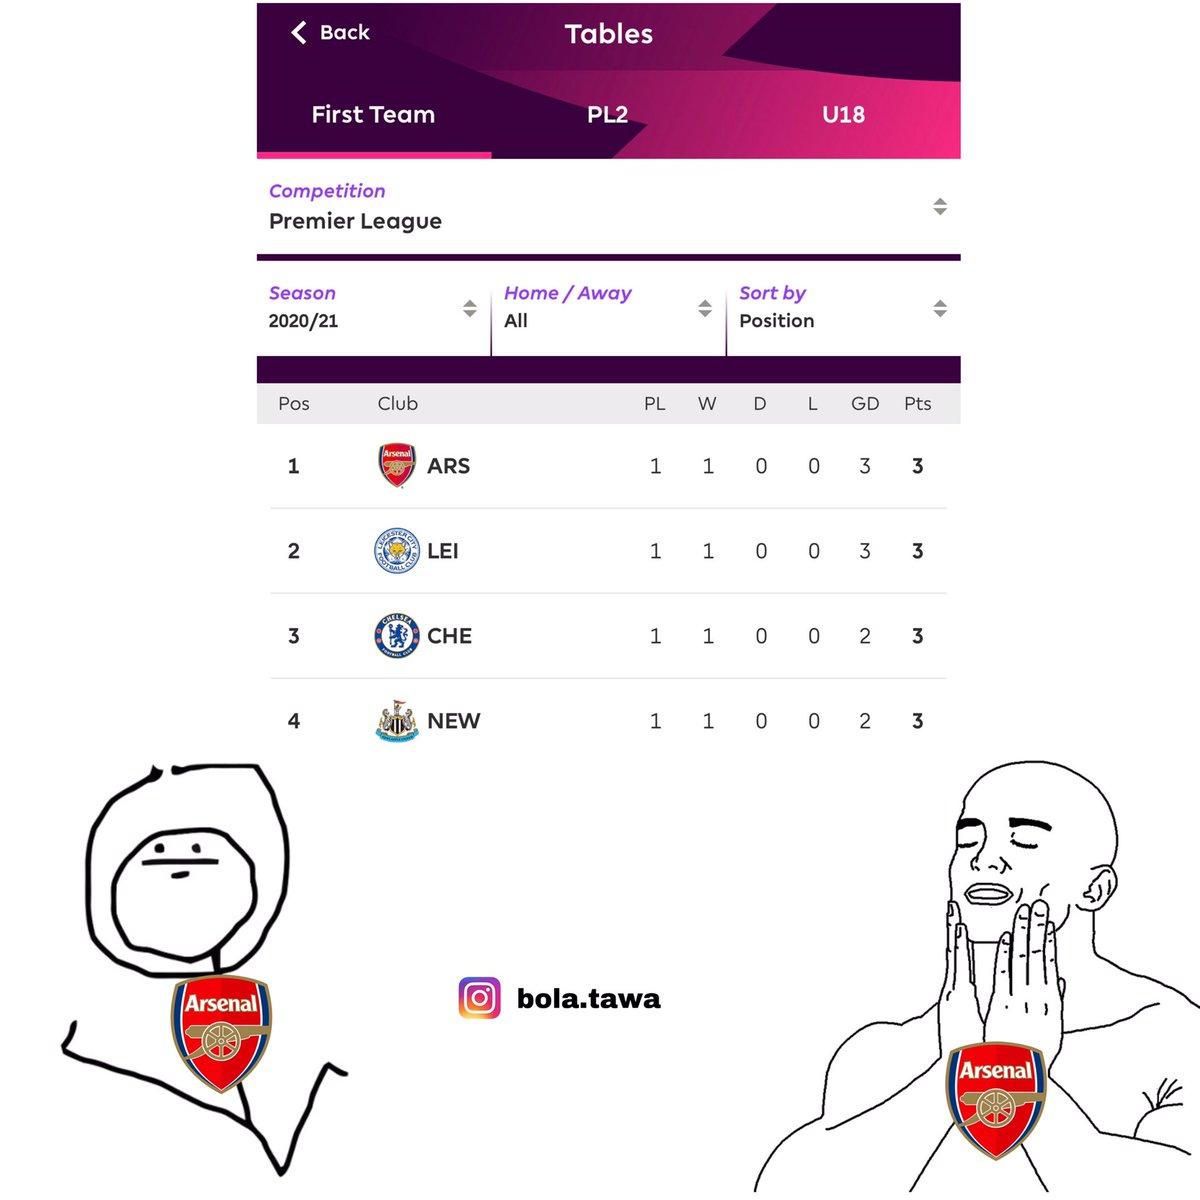 Buat fans Arsenal jangan lupa dicapture dulu klasemen sementara Premier League ini. Takutnya makin lama makin turun. Sekadar mengingatkan 🙏 https://t.co/KHuMTE9Prw